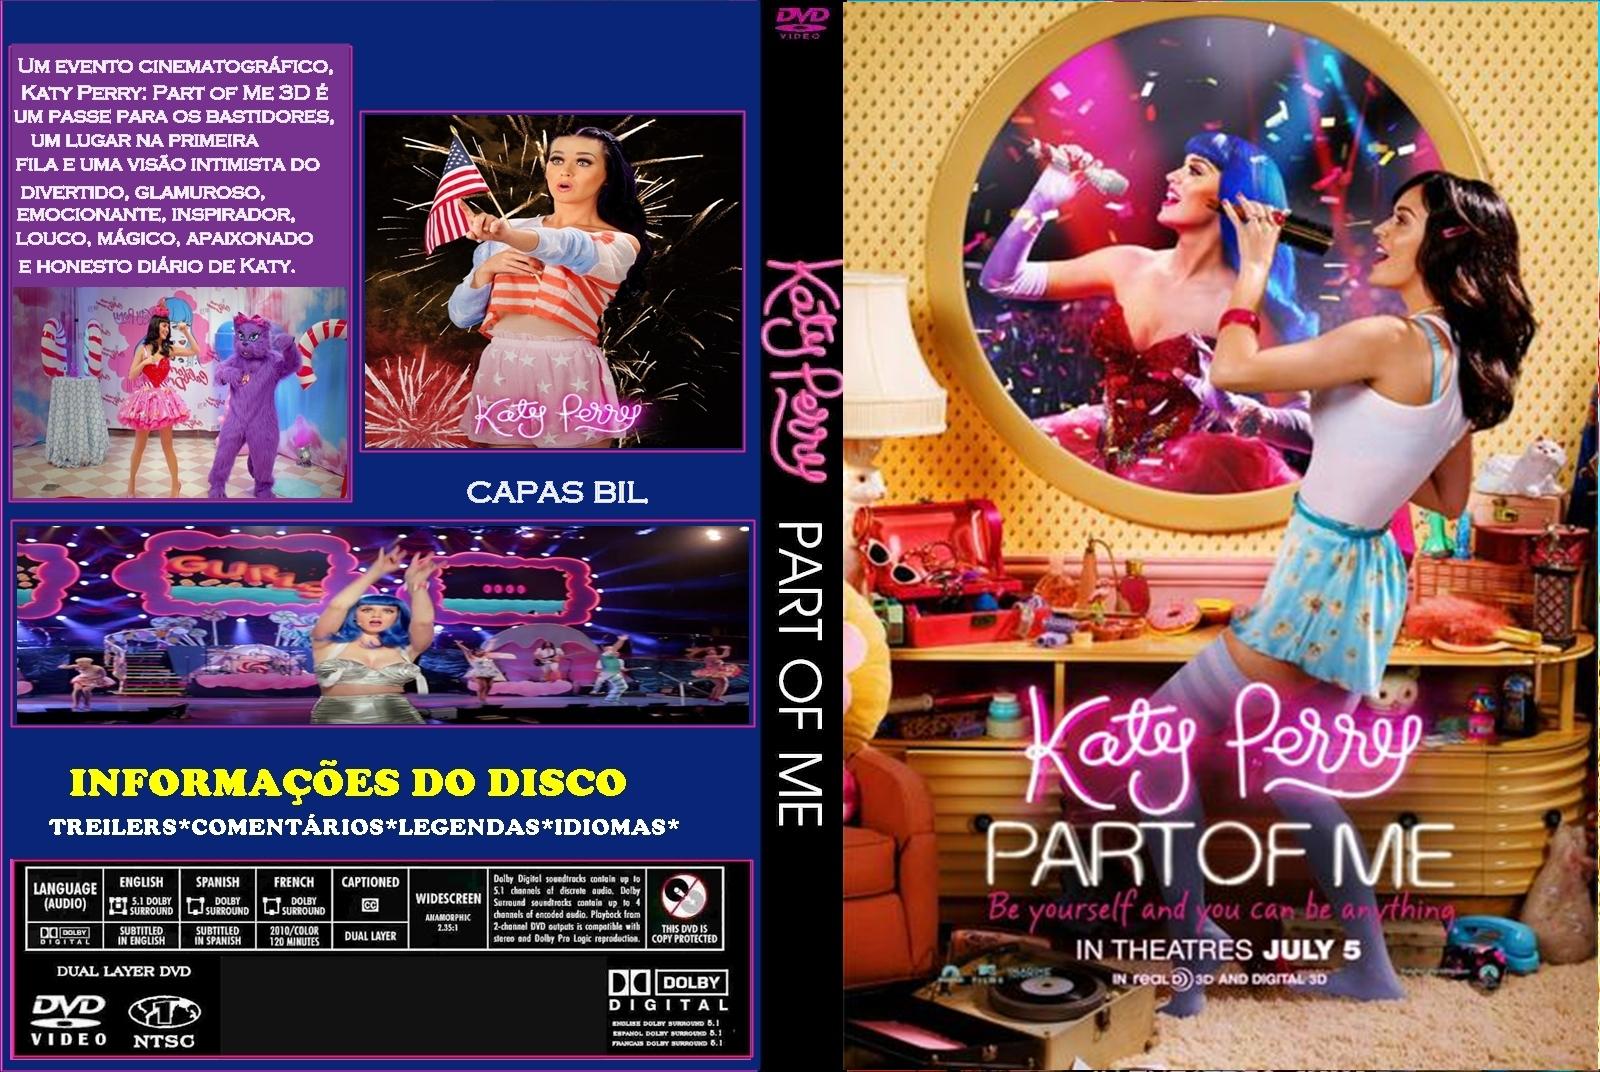 http://2.bp.blogspot.com/-NhNX8utRmu0/UFveAKL_k3I/AAAAAAAADm8/VJxOOfG3Gx4/s1600/Katy+Perry+Part+of+Me3.jpg